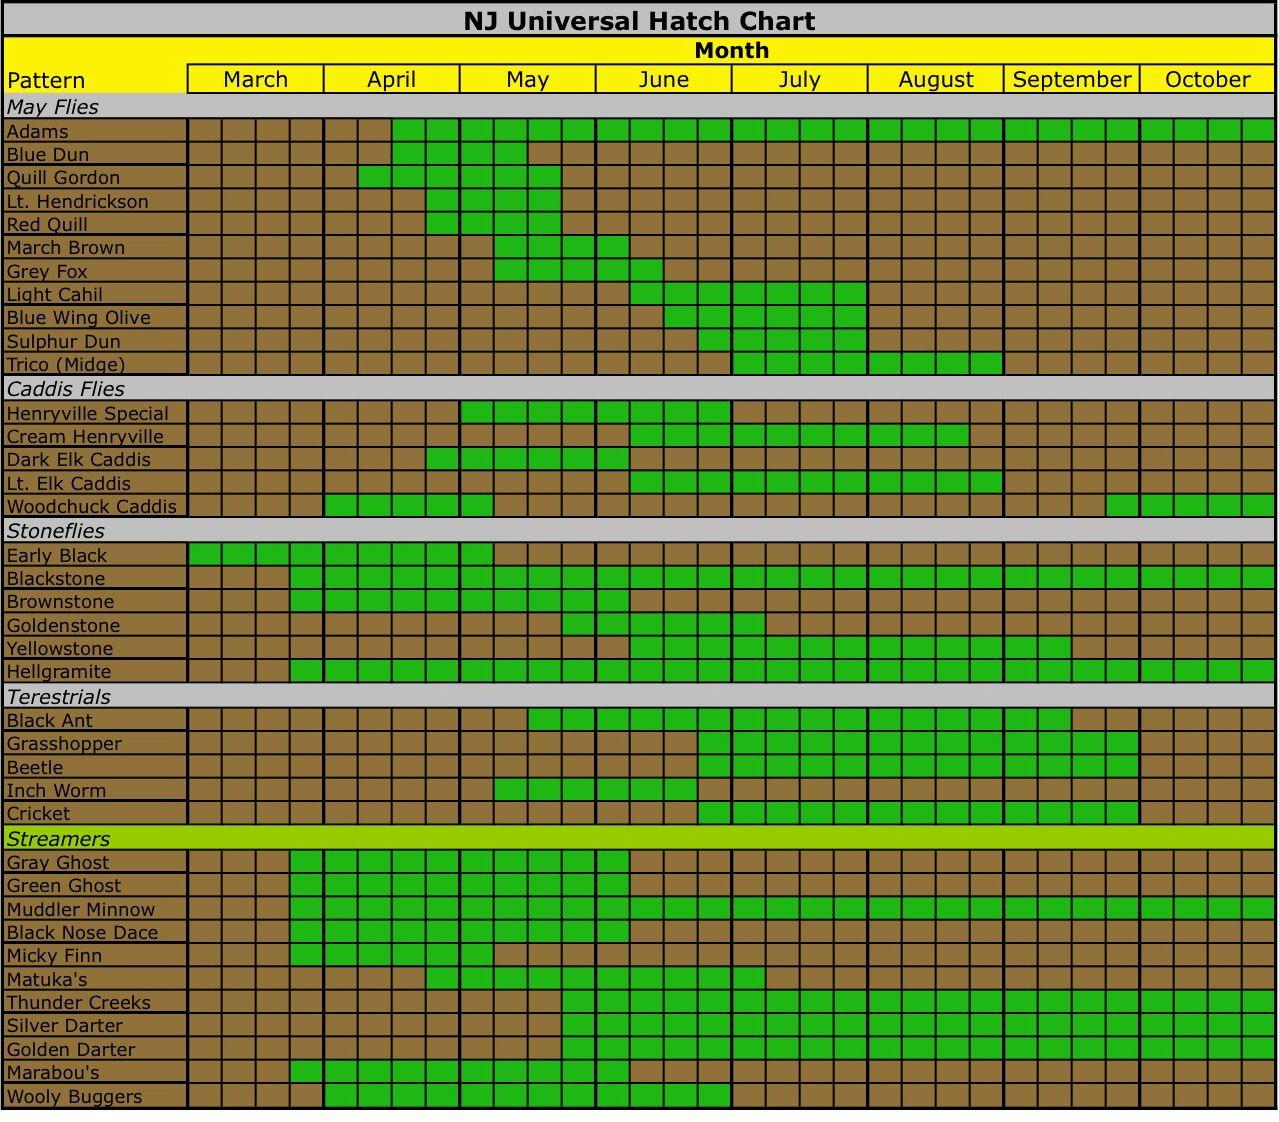 Nj hatch chart fly fishing pinterest fly fishing for Fly fishing flies chart